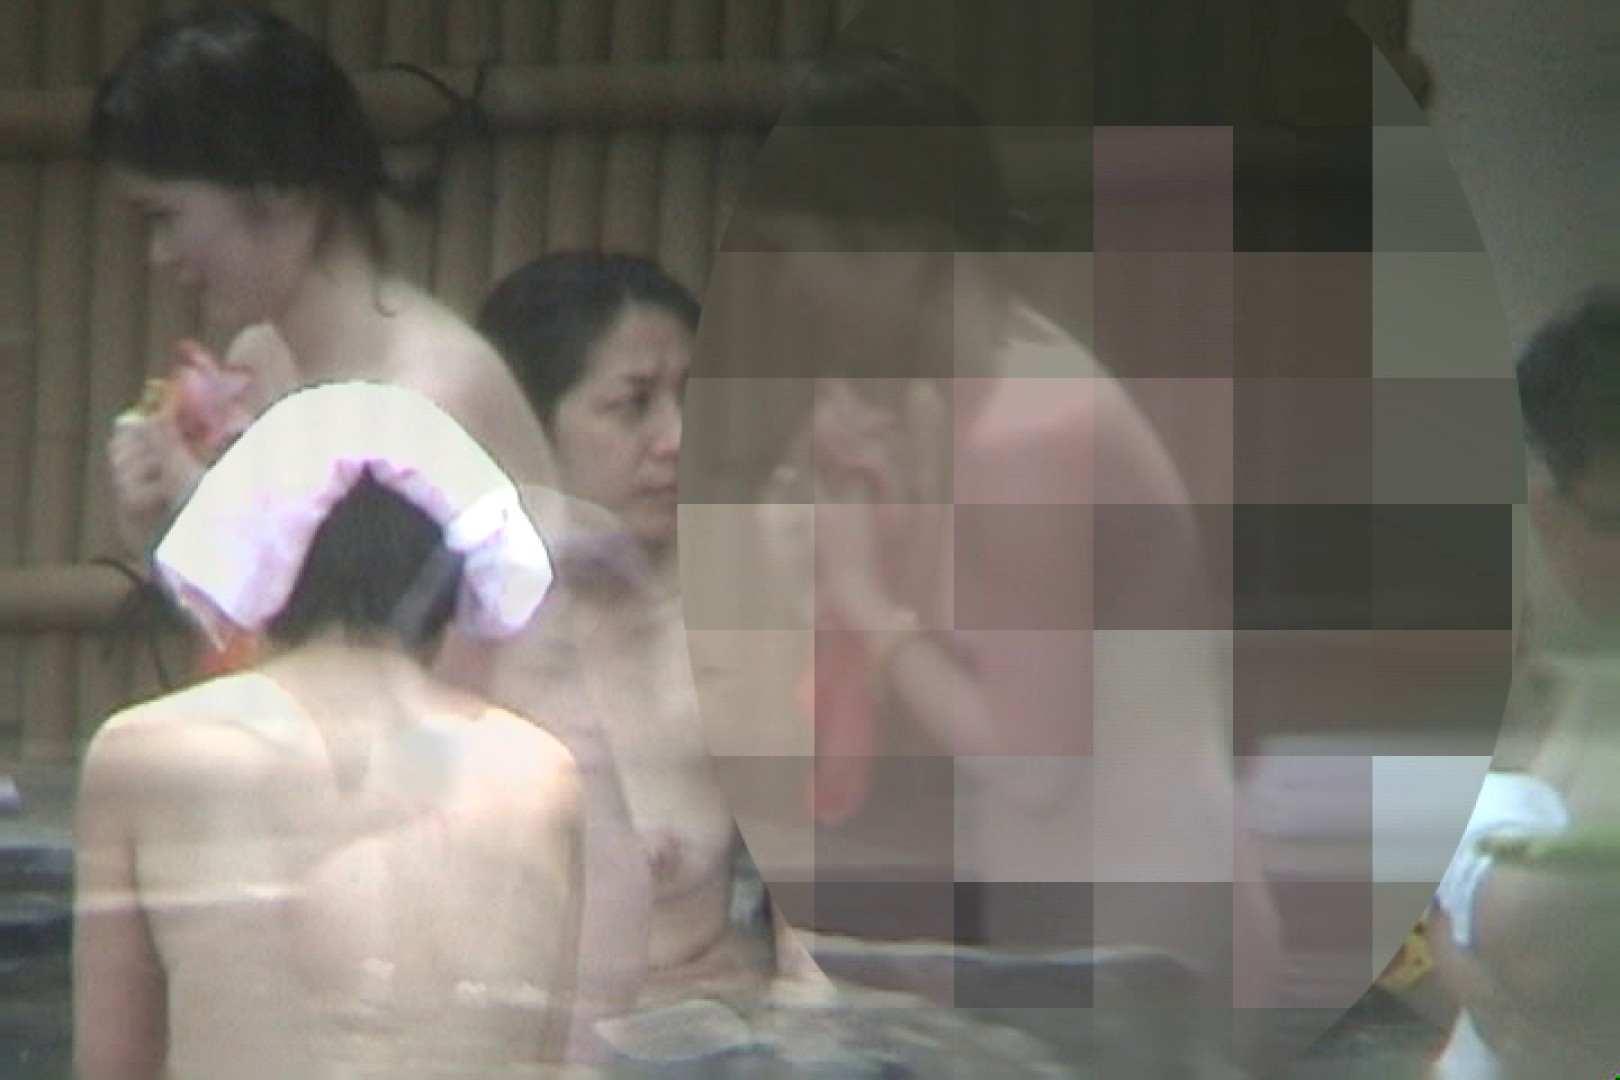 Aquaな露天風呂Vol.54【VIP限定】 盗撮シリーズ | 露天風呂編  96PIX 3